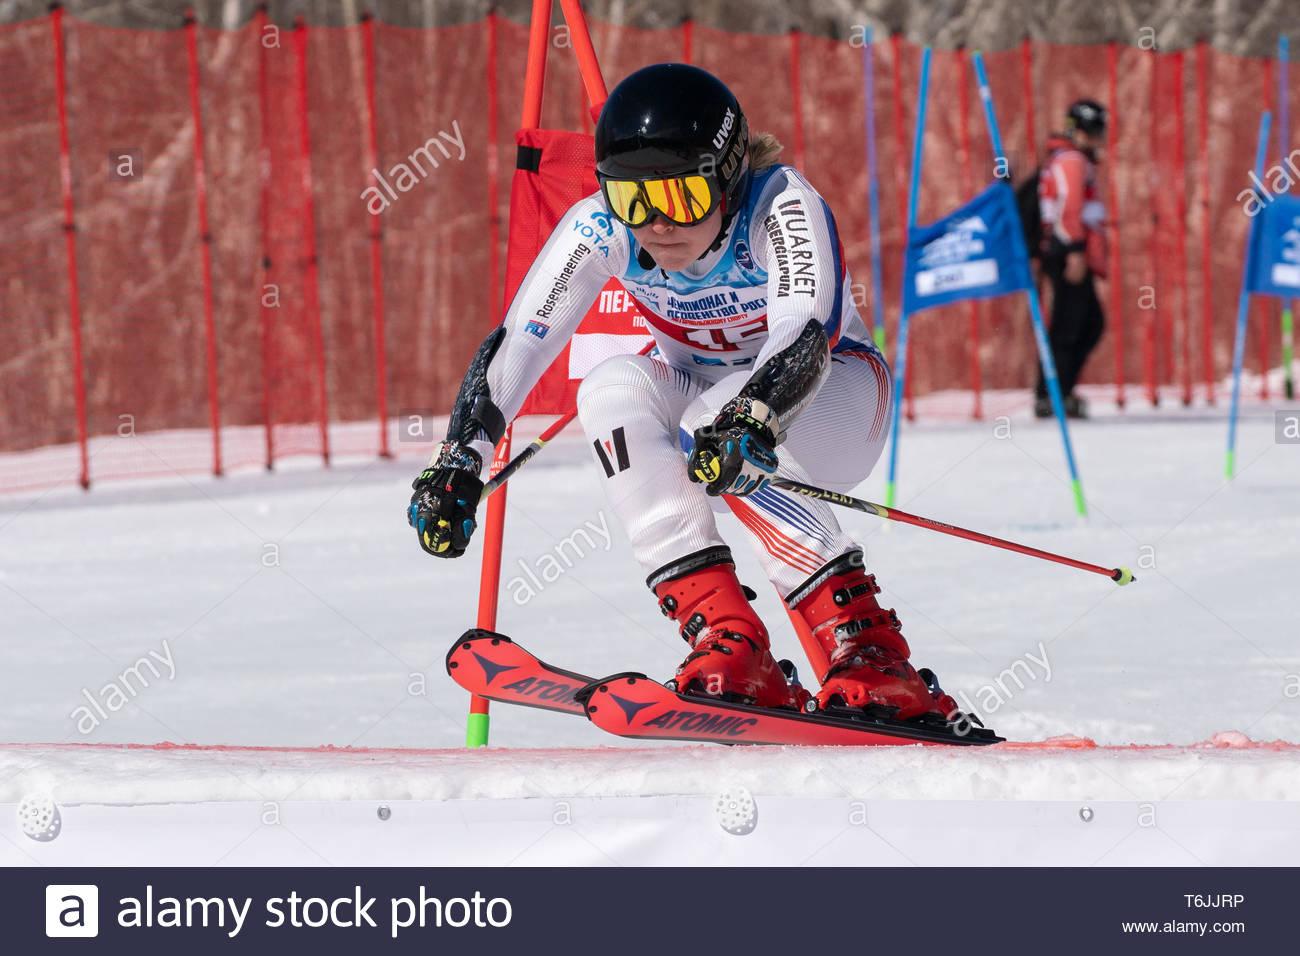 MOROZNAYA MOUNT, KAMCHATKA PENINSULA, RUSSIA - MARCH 30, 2019: Russian Federation Alpine Skiing Championship, parallel slalom. Mount skier Pogrebitska - Stock Image